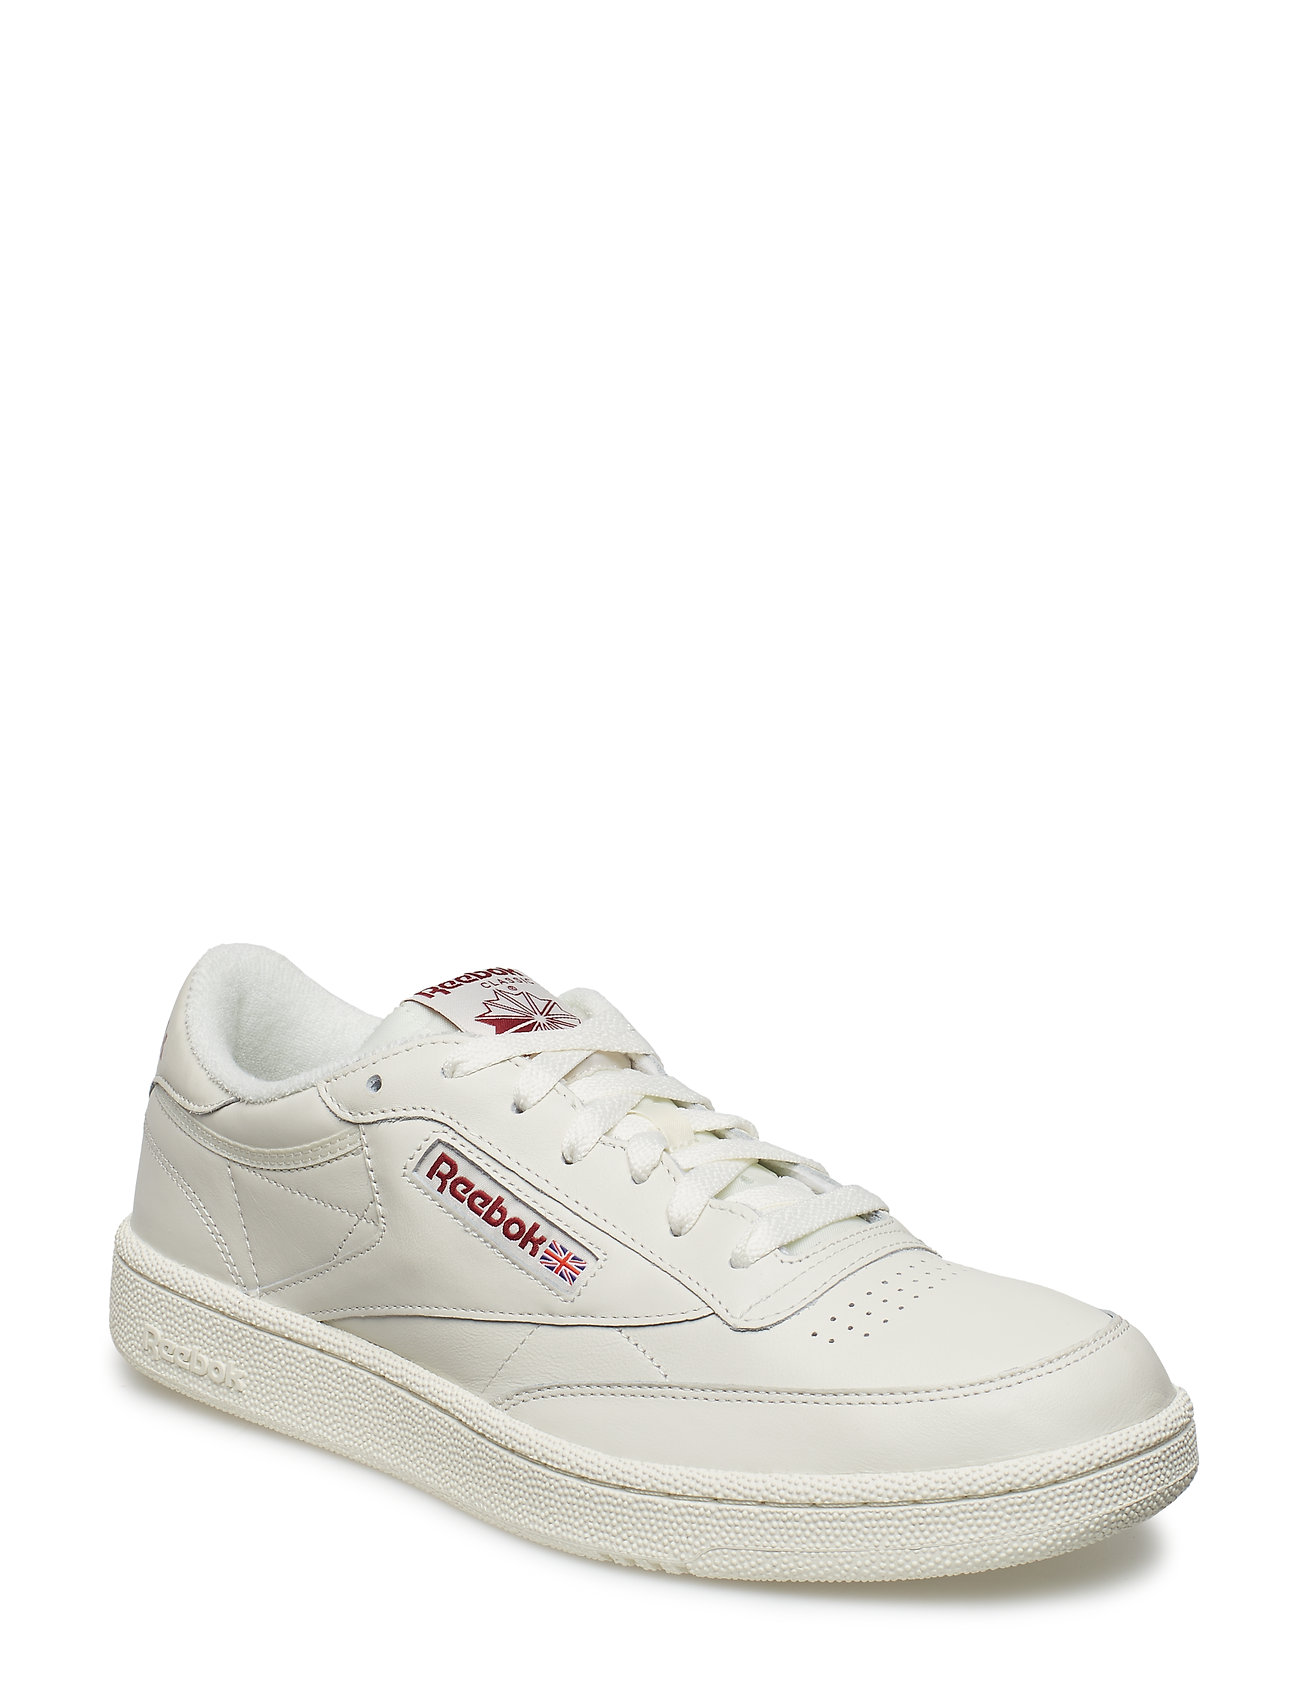 Reebok Club C 85 TG | Grau | Sneaker | BD1886 | Caliroots